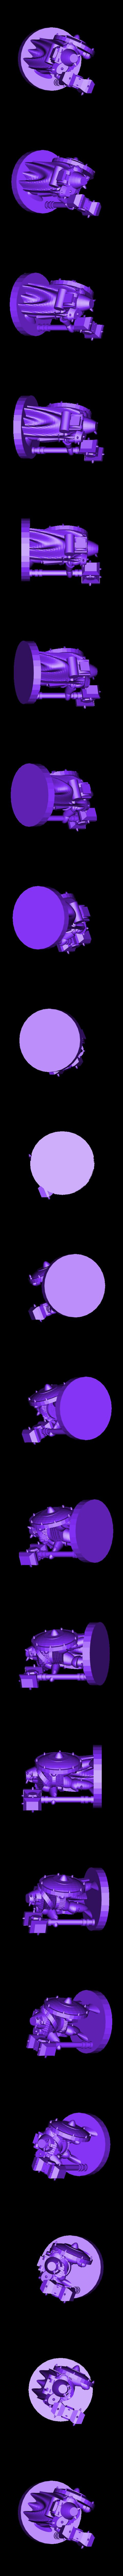 Dwarf_Fighter.stl Download free STL file DnD Dwarf • 3D printable object, mrhers2